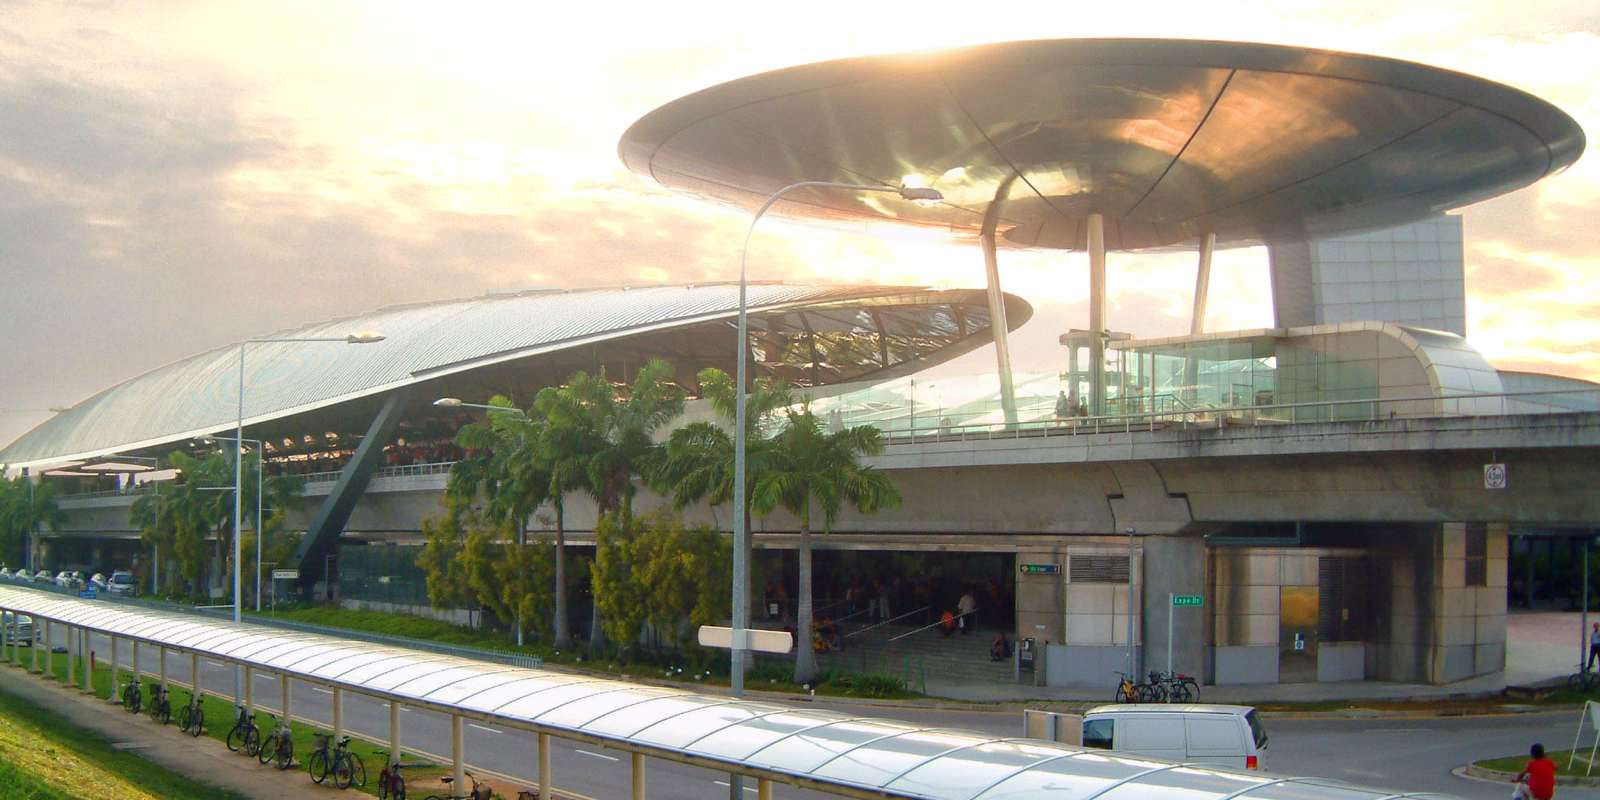 singapore-tube-prolunga